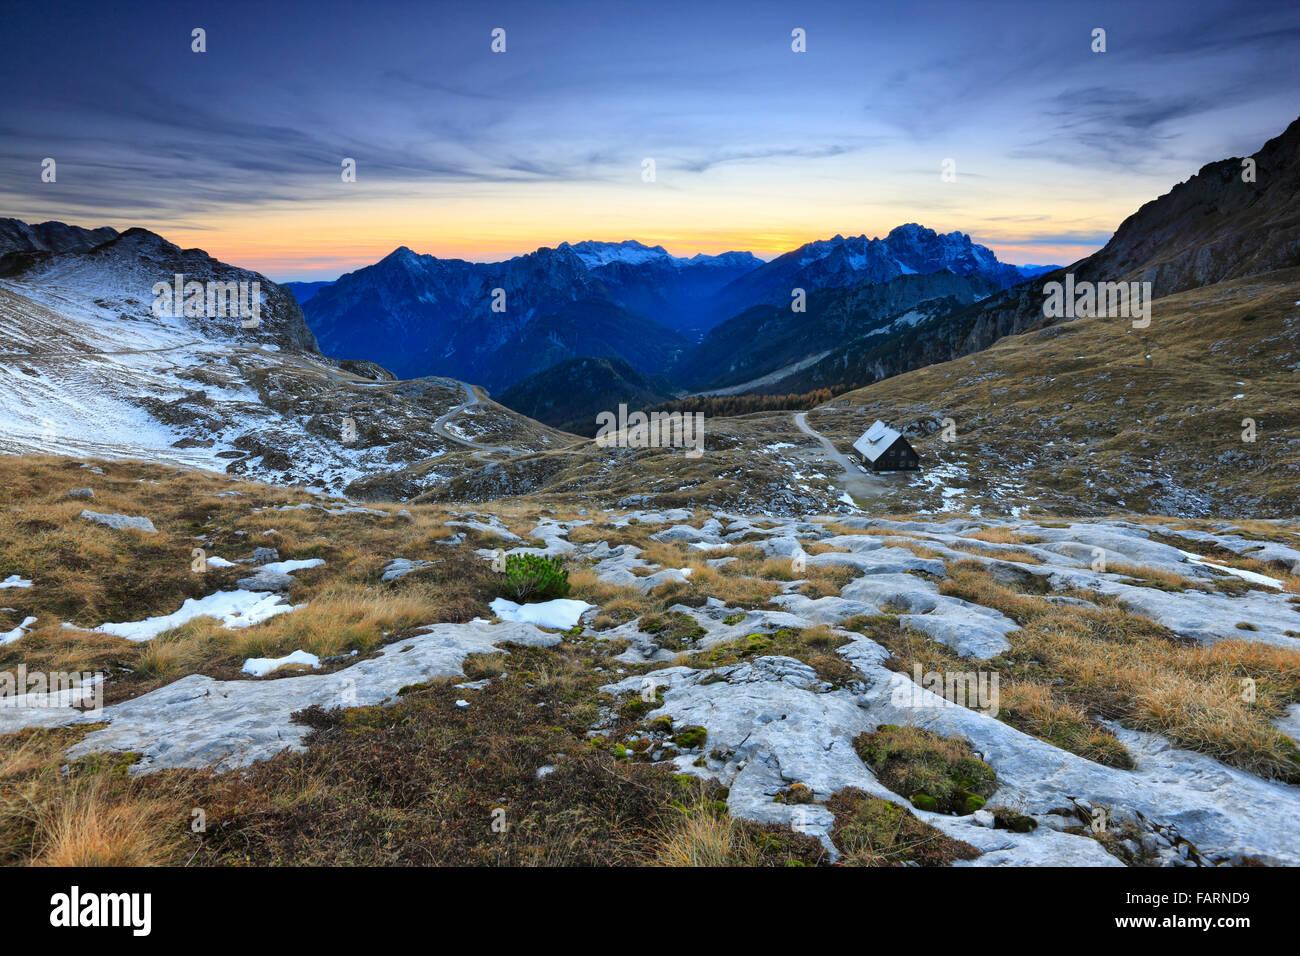 Mountain sunset landscape. Mangart, Julian alps Slovenia and Italy. Stock Photo